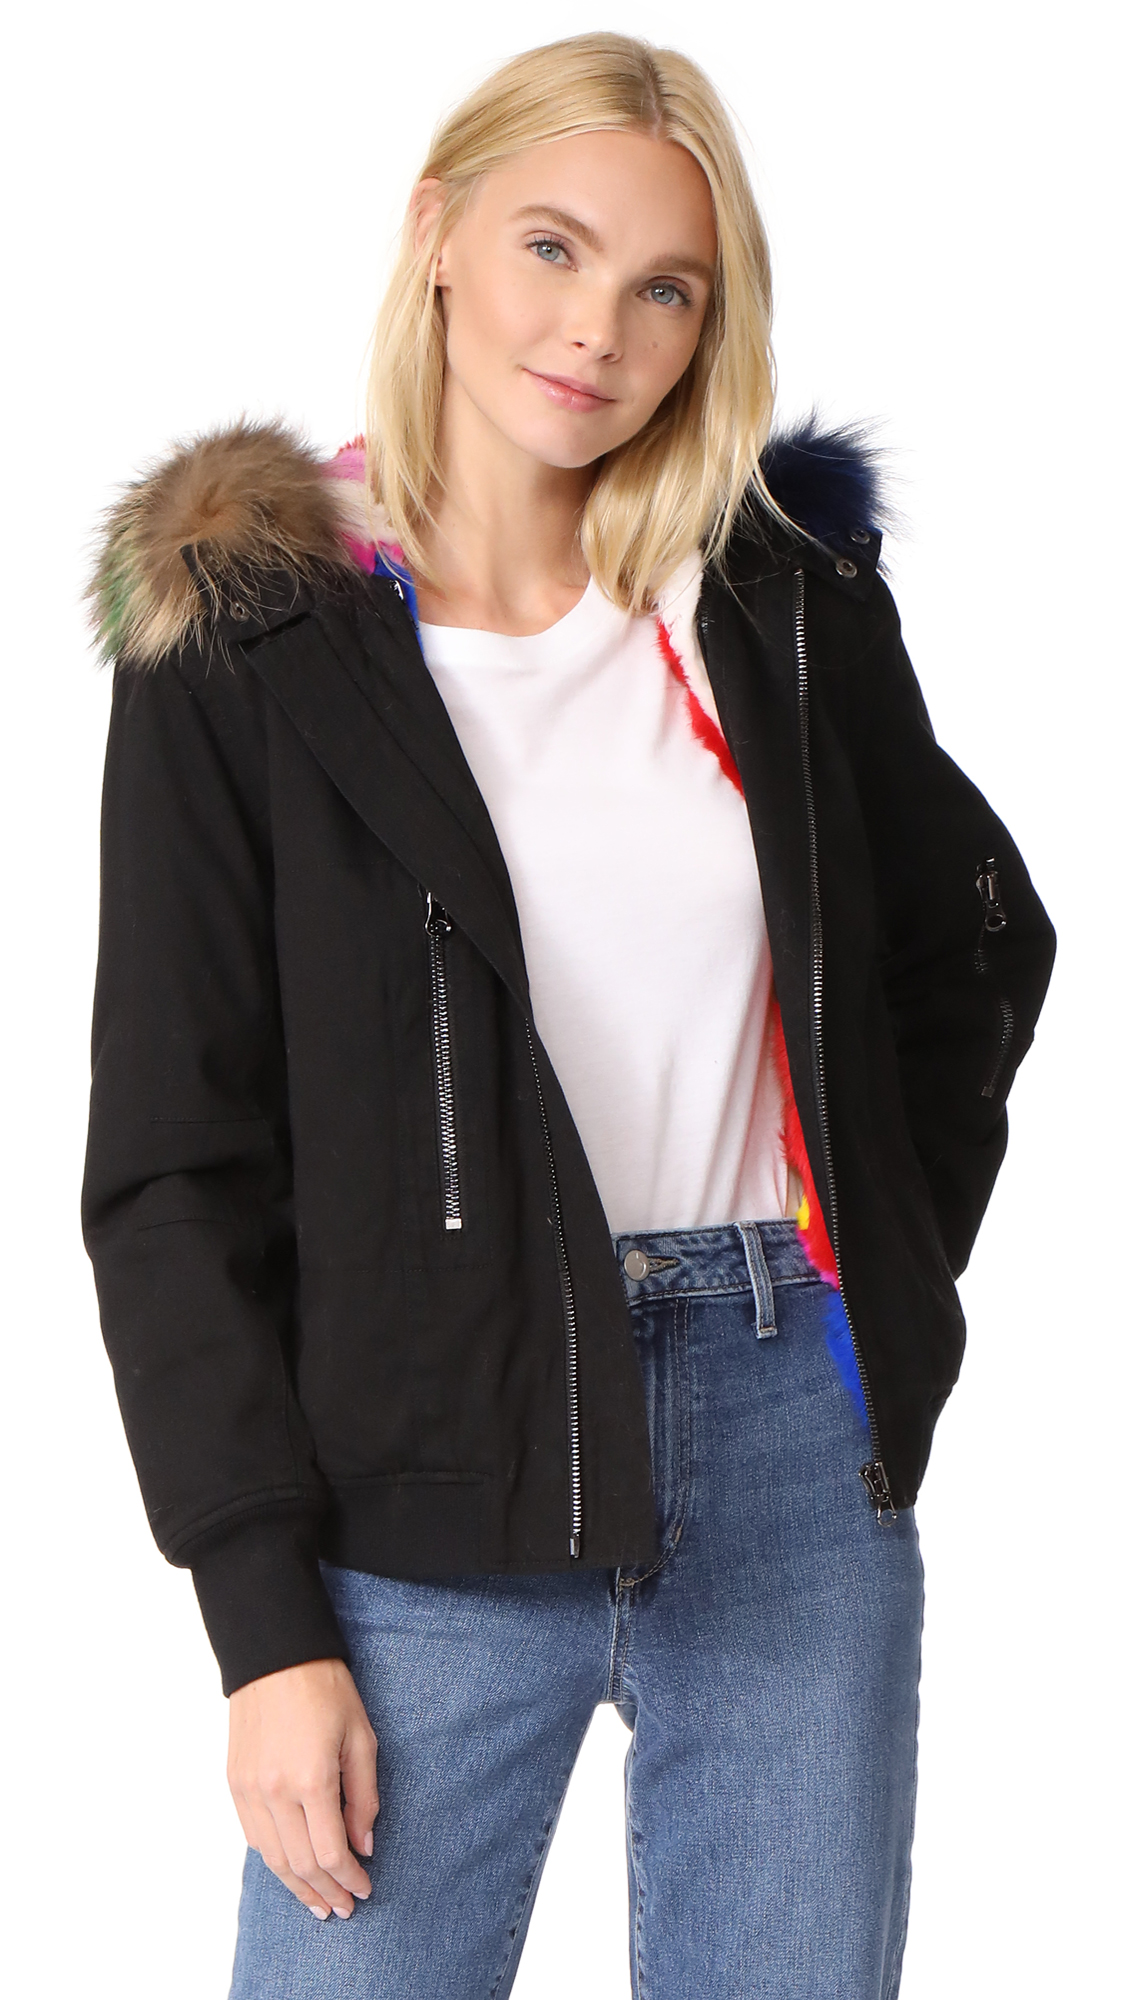 Adrienne Landau Hooded Bomber Jacket with Fur Lining - Black/Multi